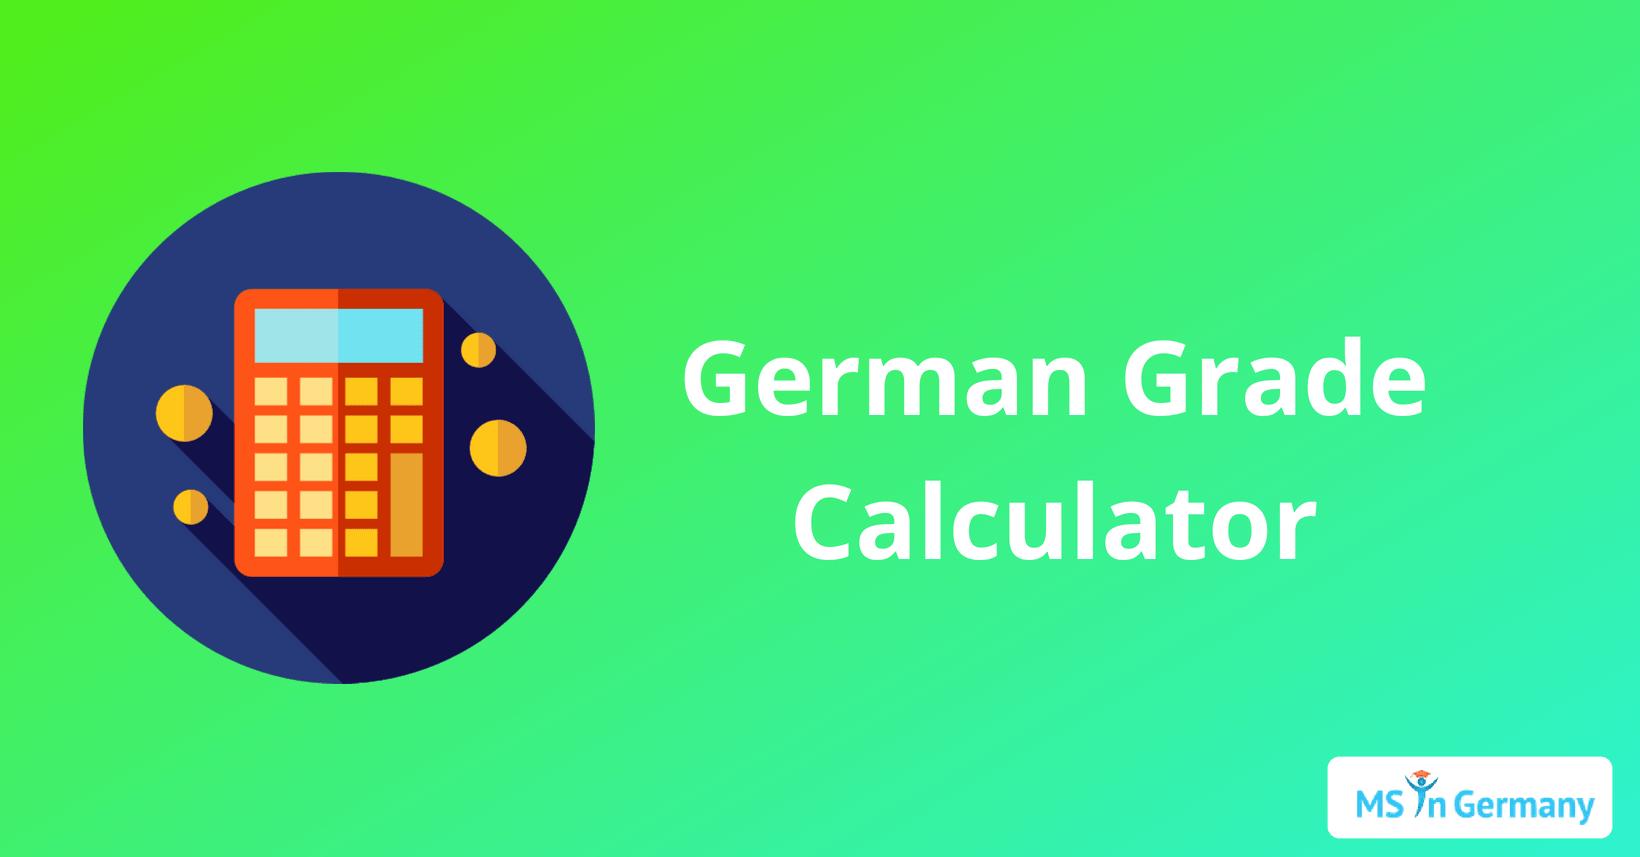 German Grade Calculator - MS in Germany™